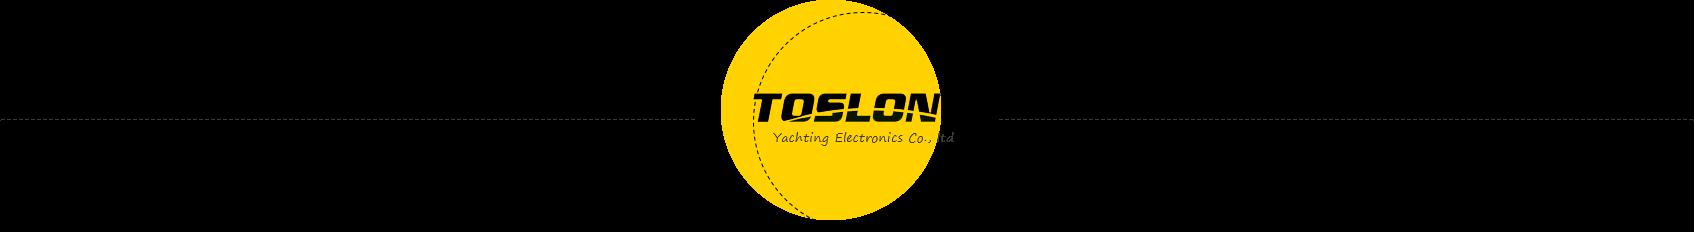 toslon-romania